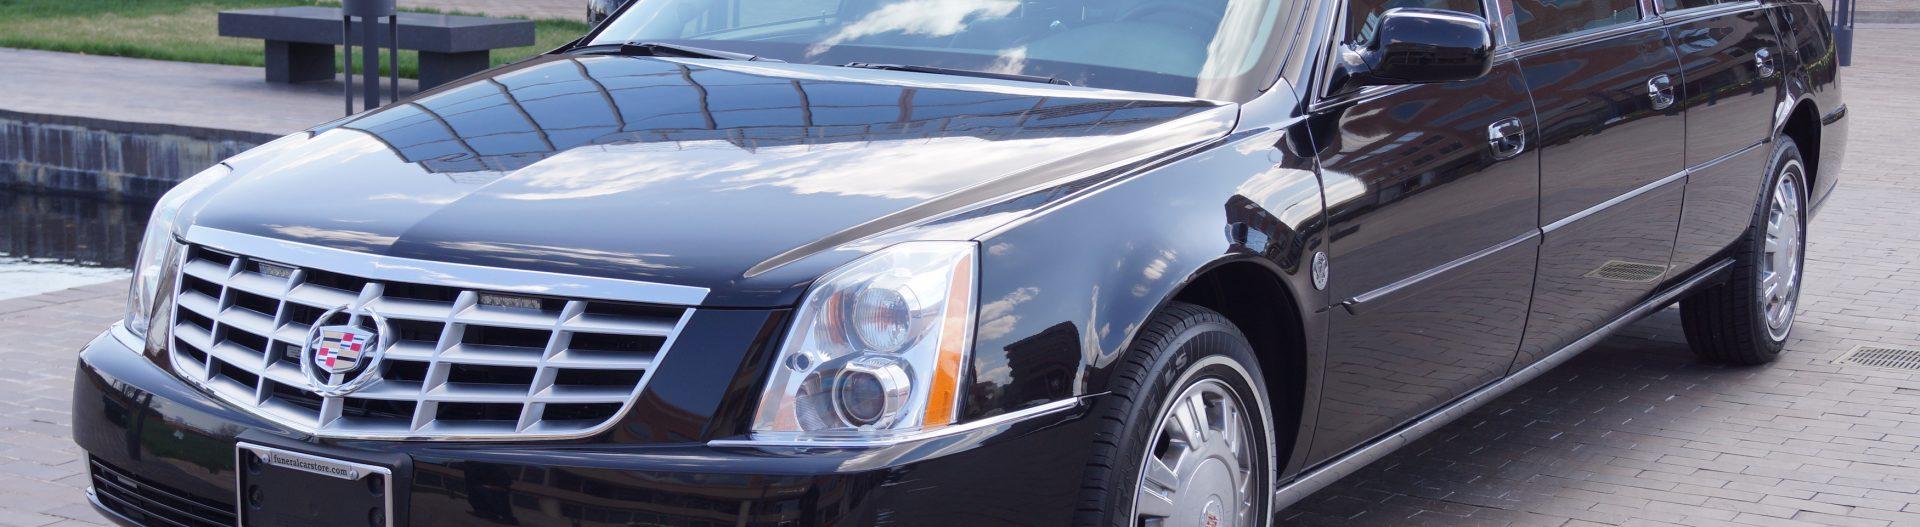 2011 Cadillac Ambassador